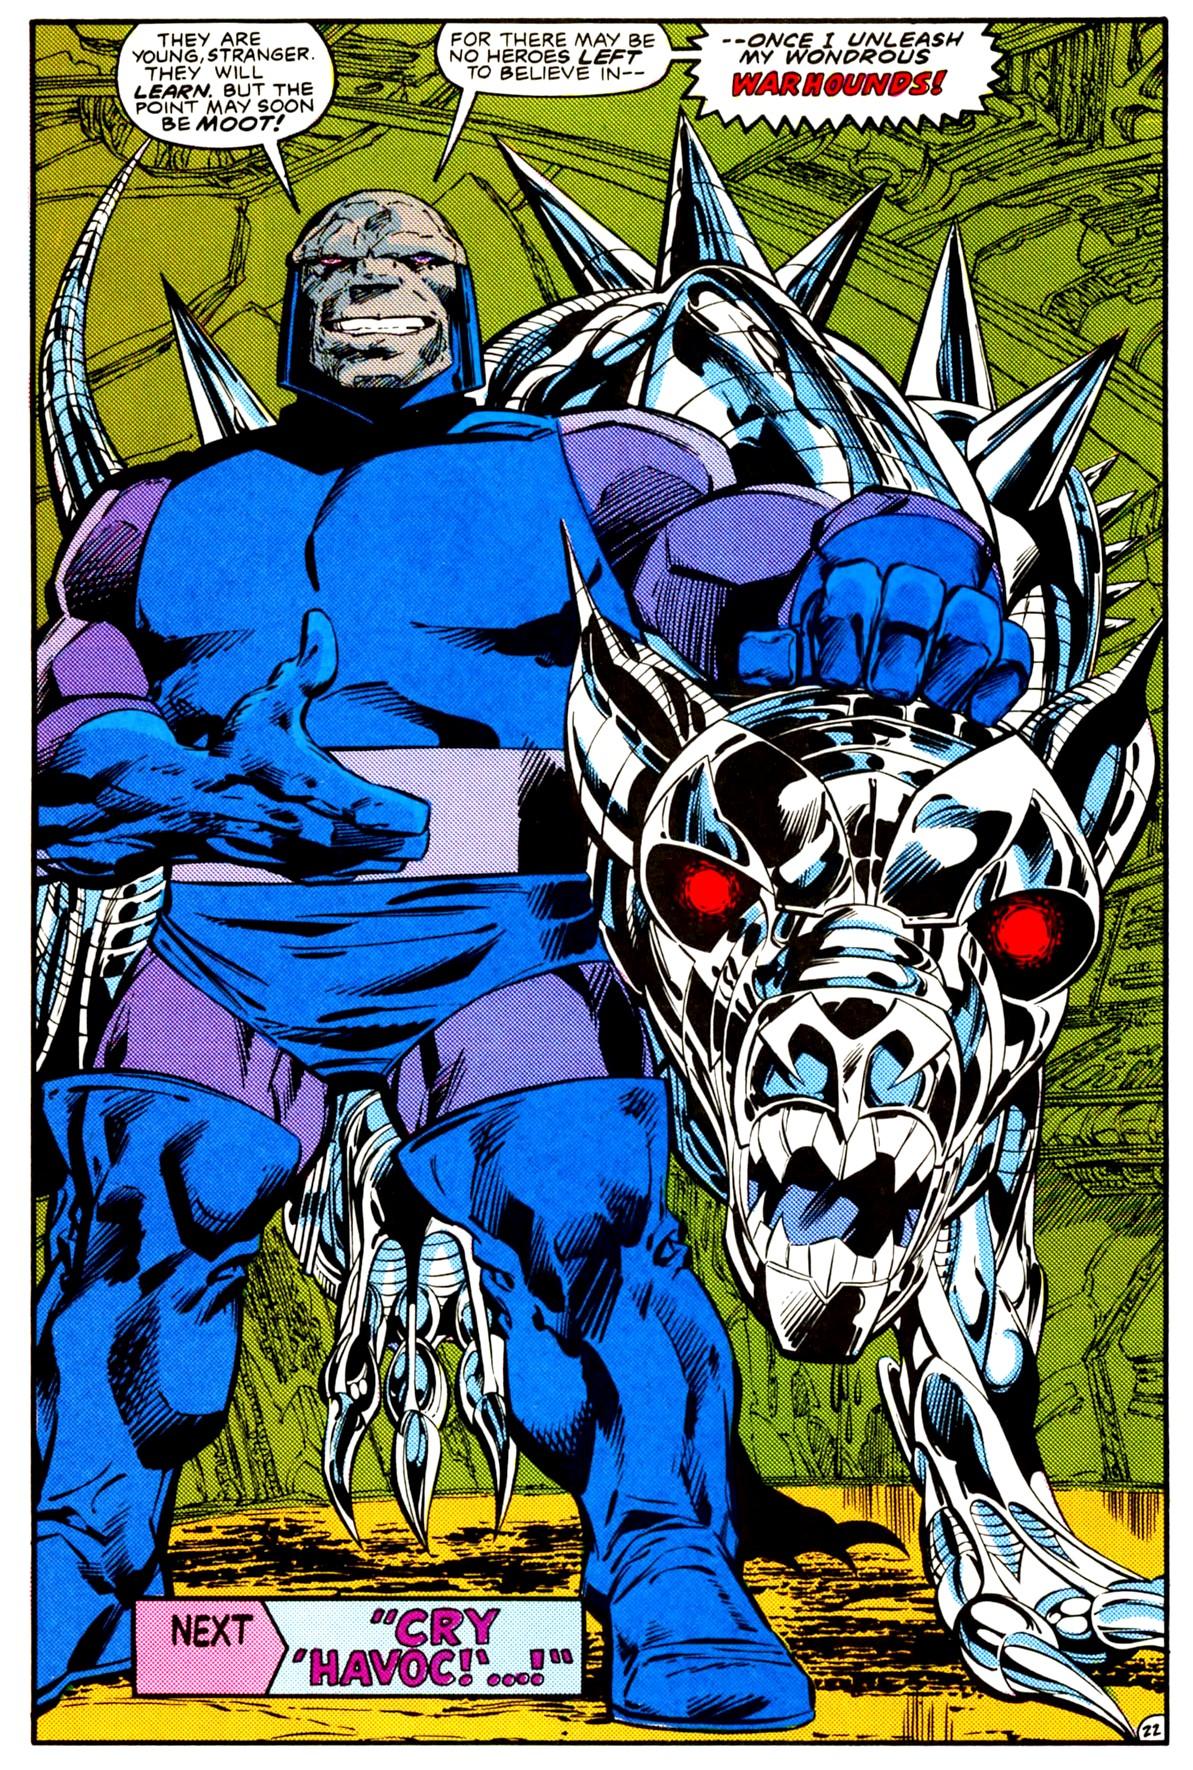 Image - Darkseid 0026.jpg - DC Comics Database